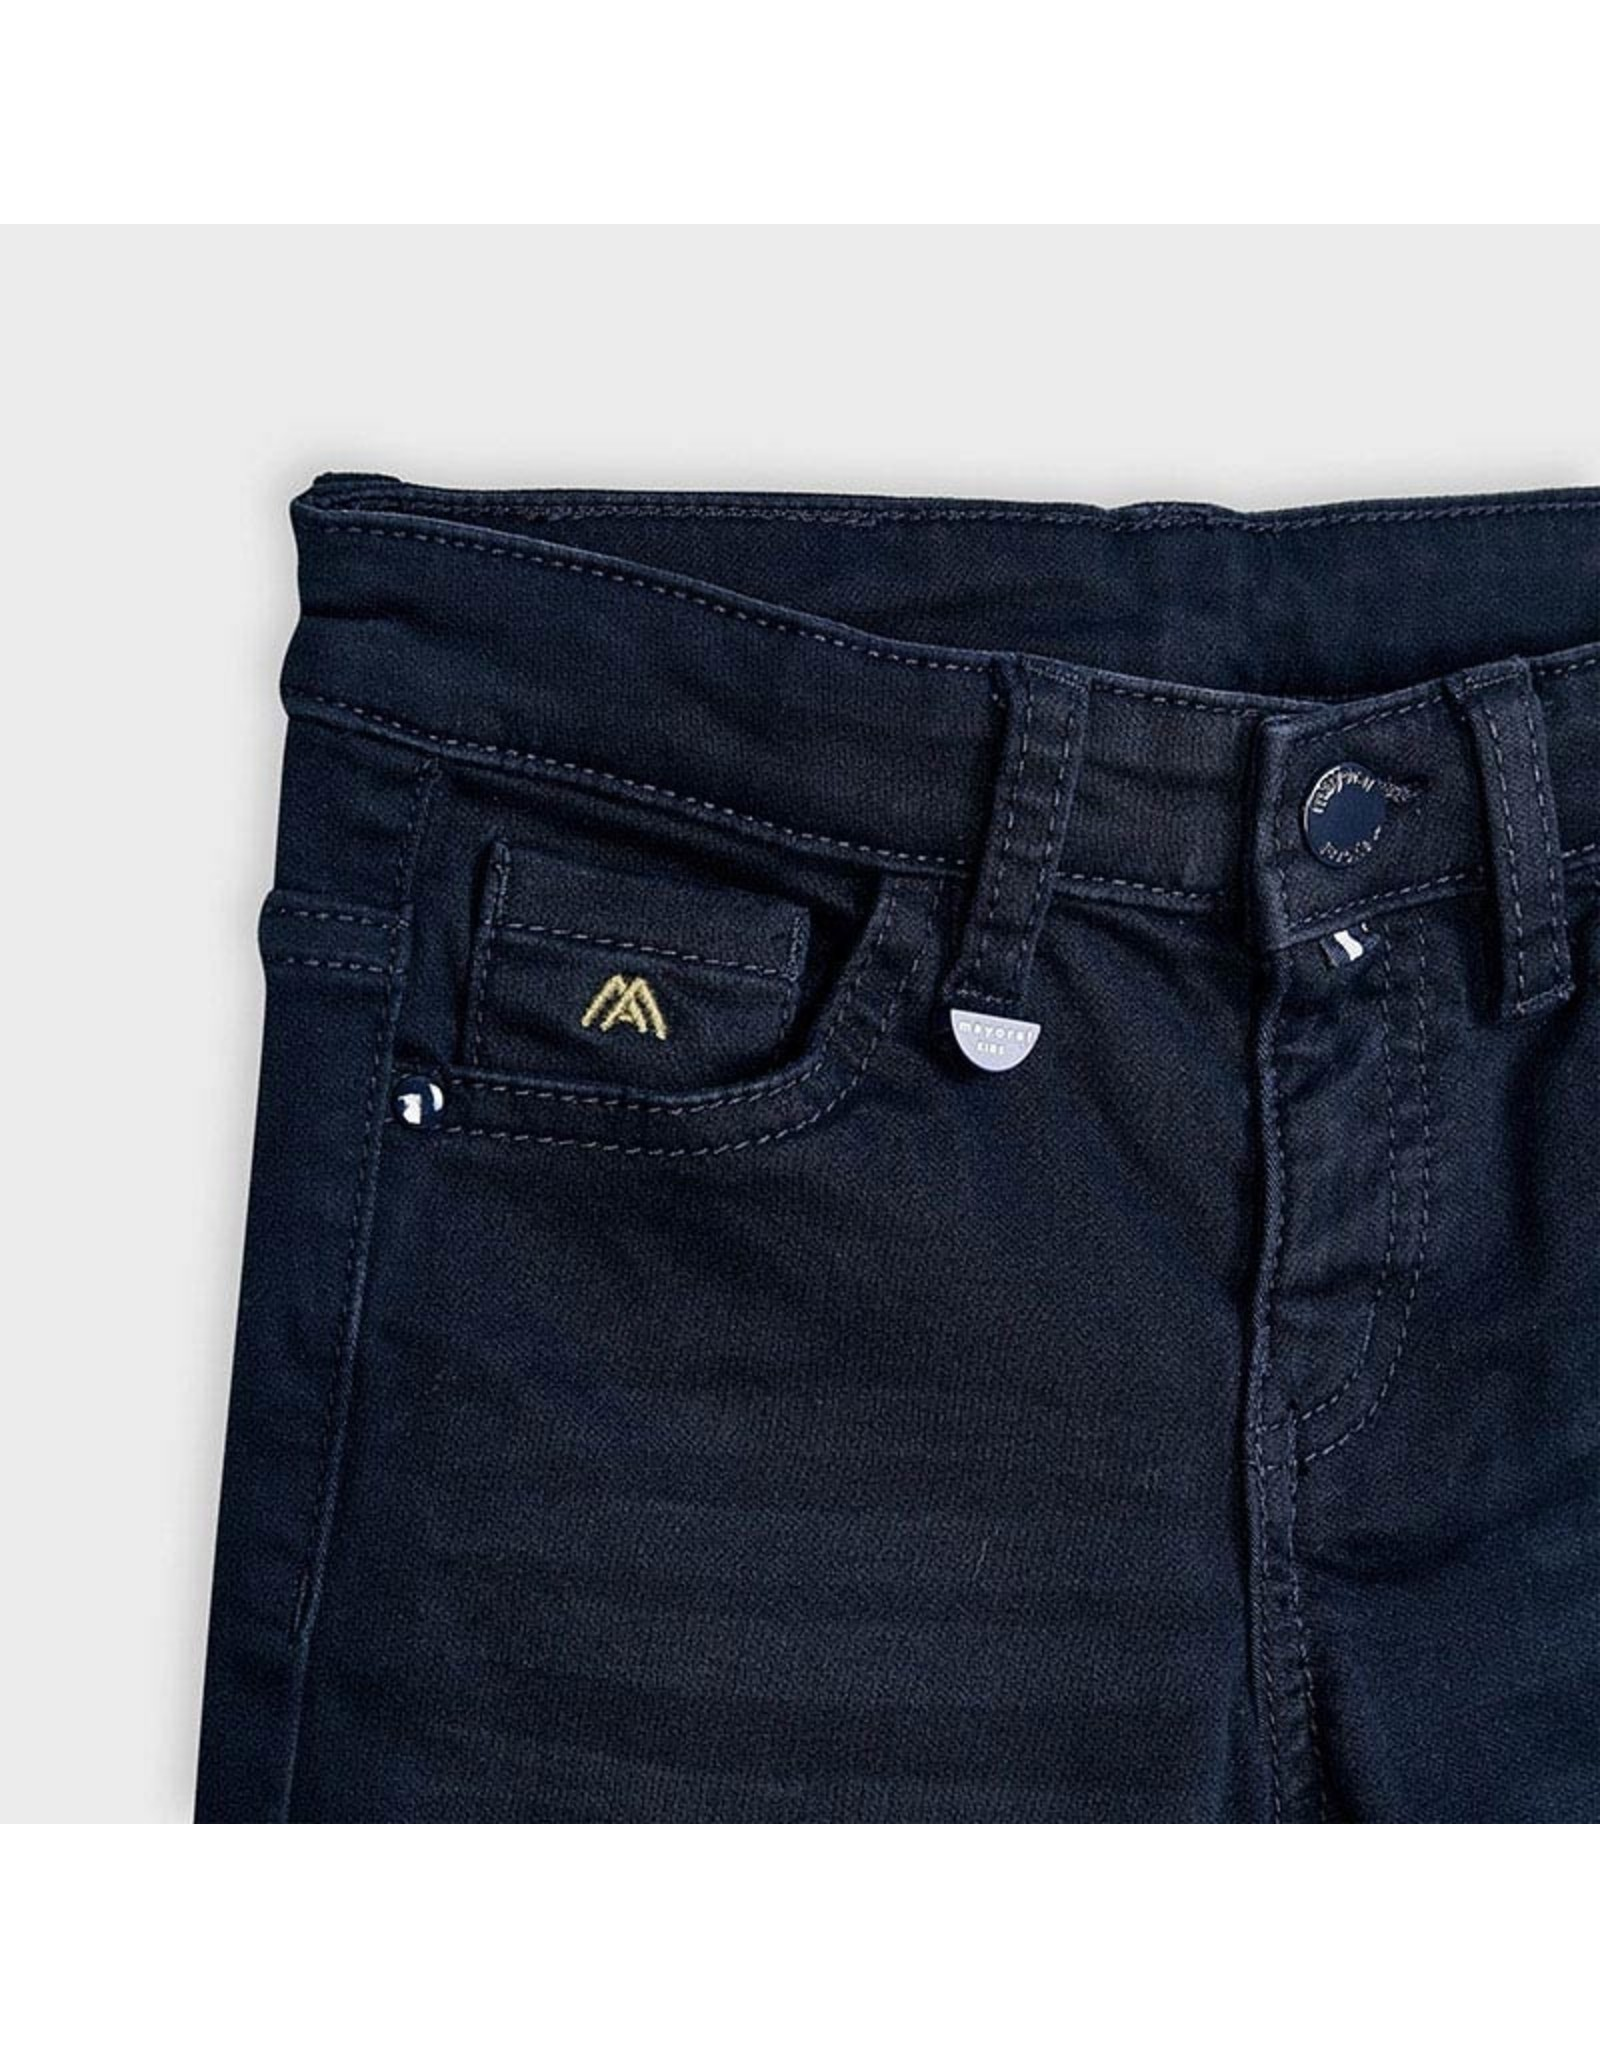 Mayoral 5 pocket soft pant Navy